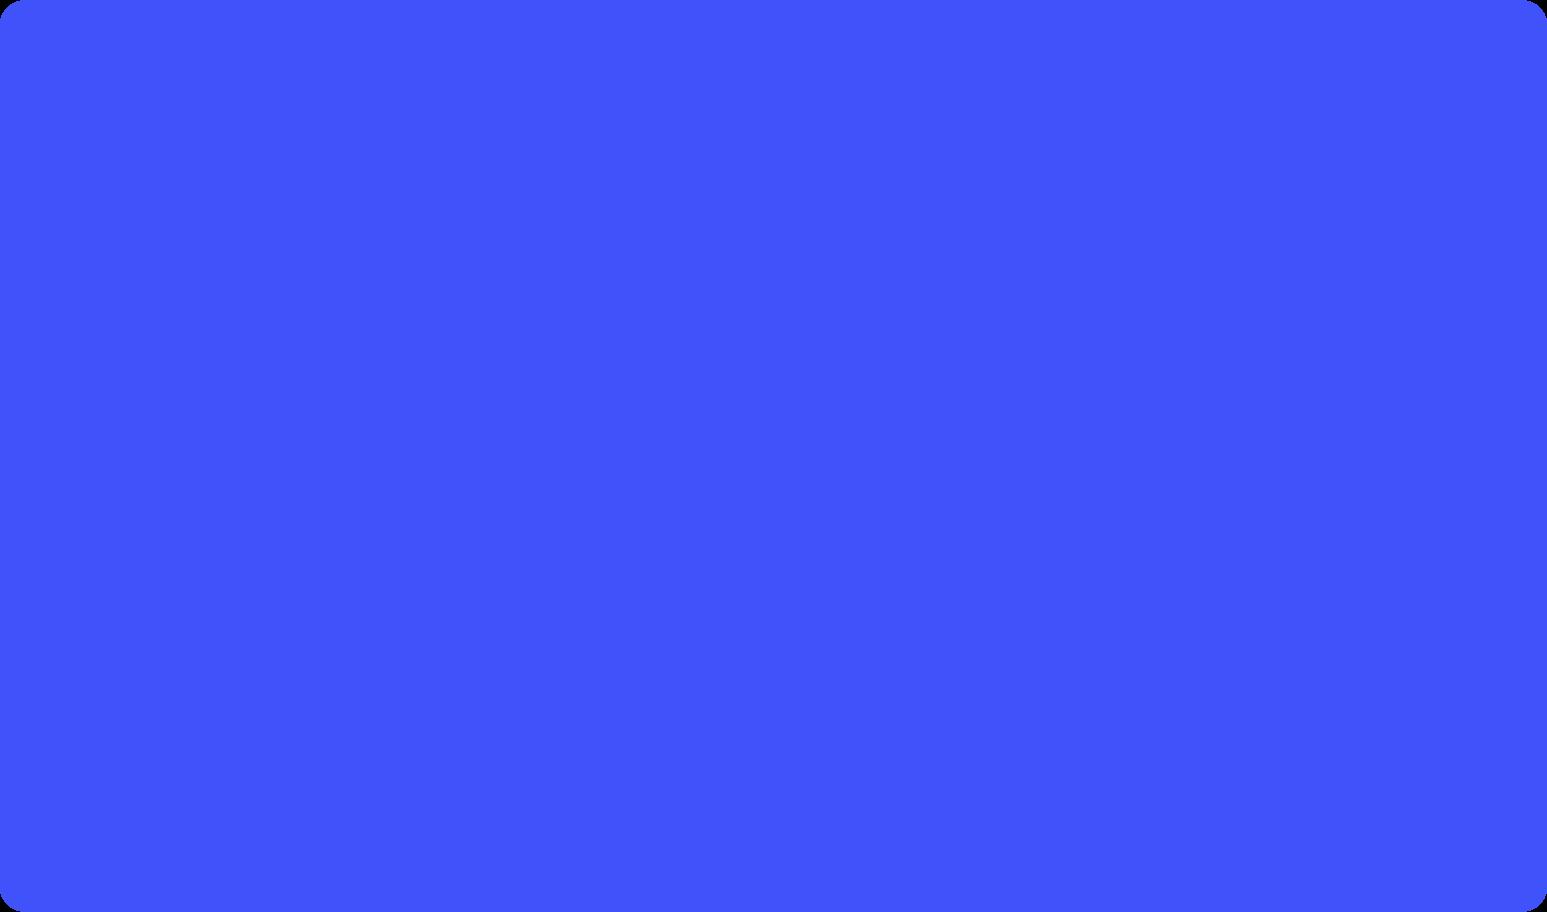 rectangle shape Clipart illustration in PNG, SVG